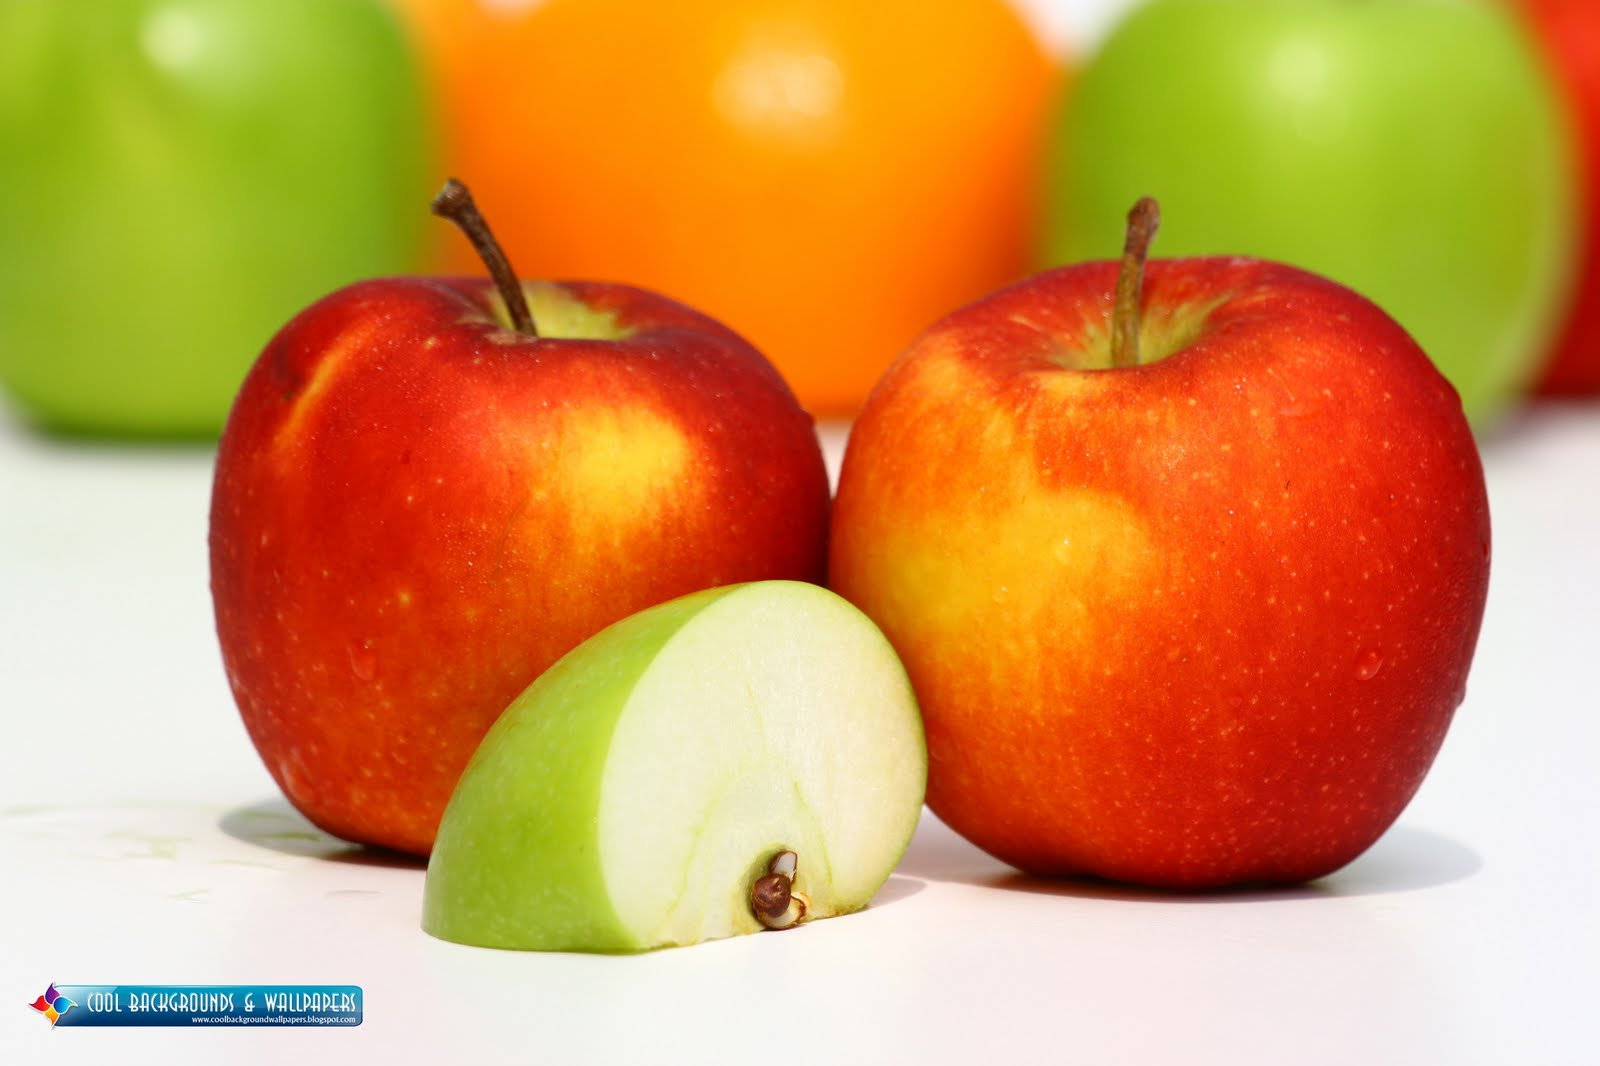 QQ Wallpapers: Fresh Apples HD Wallpaper